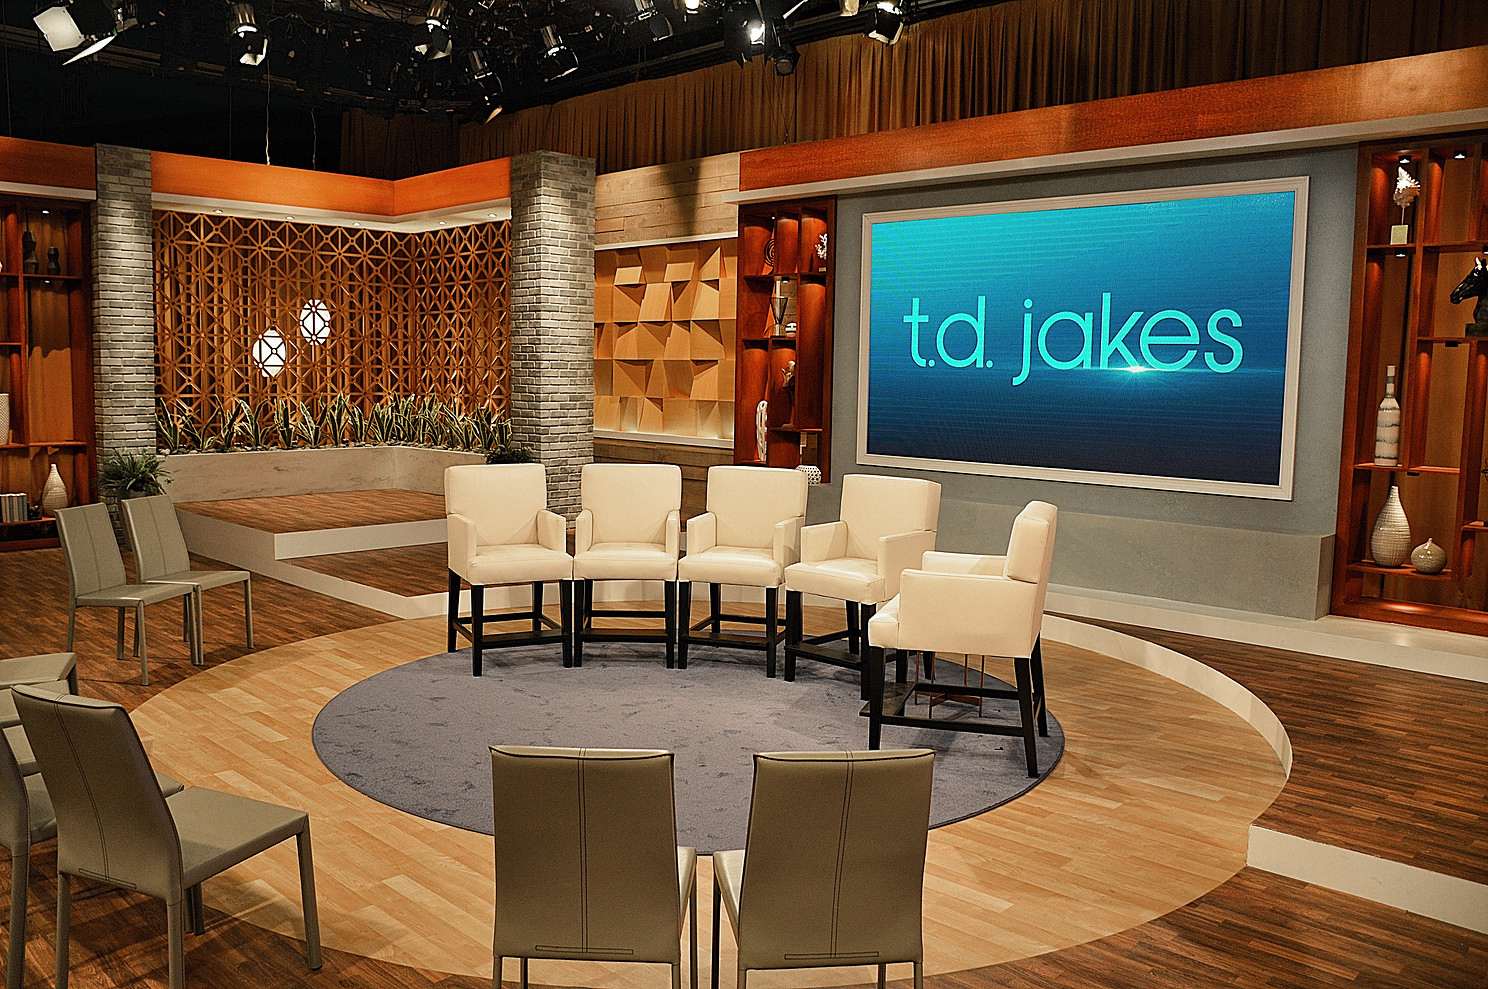 TD Jakes Broadcast Set Design Gallery